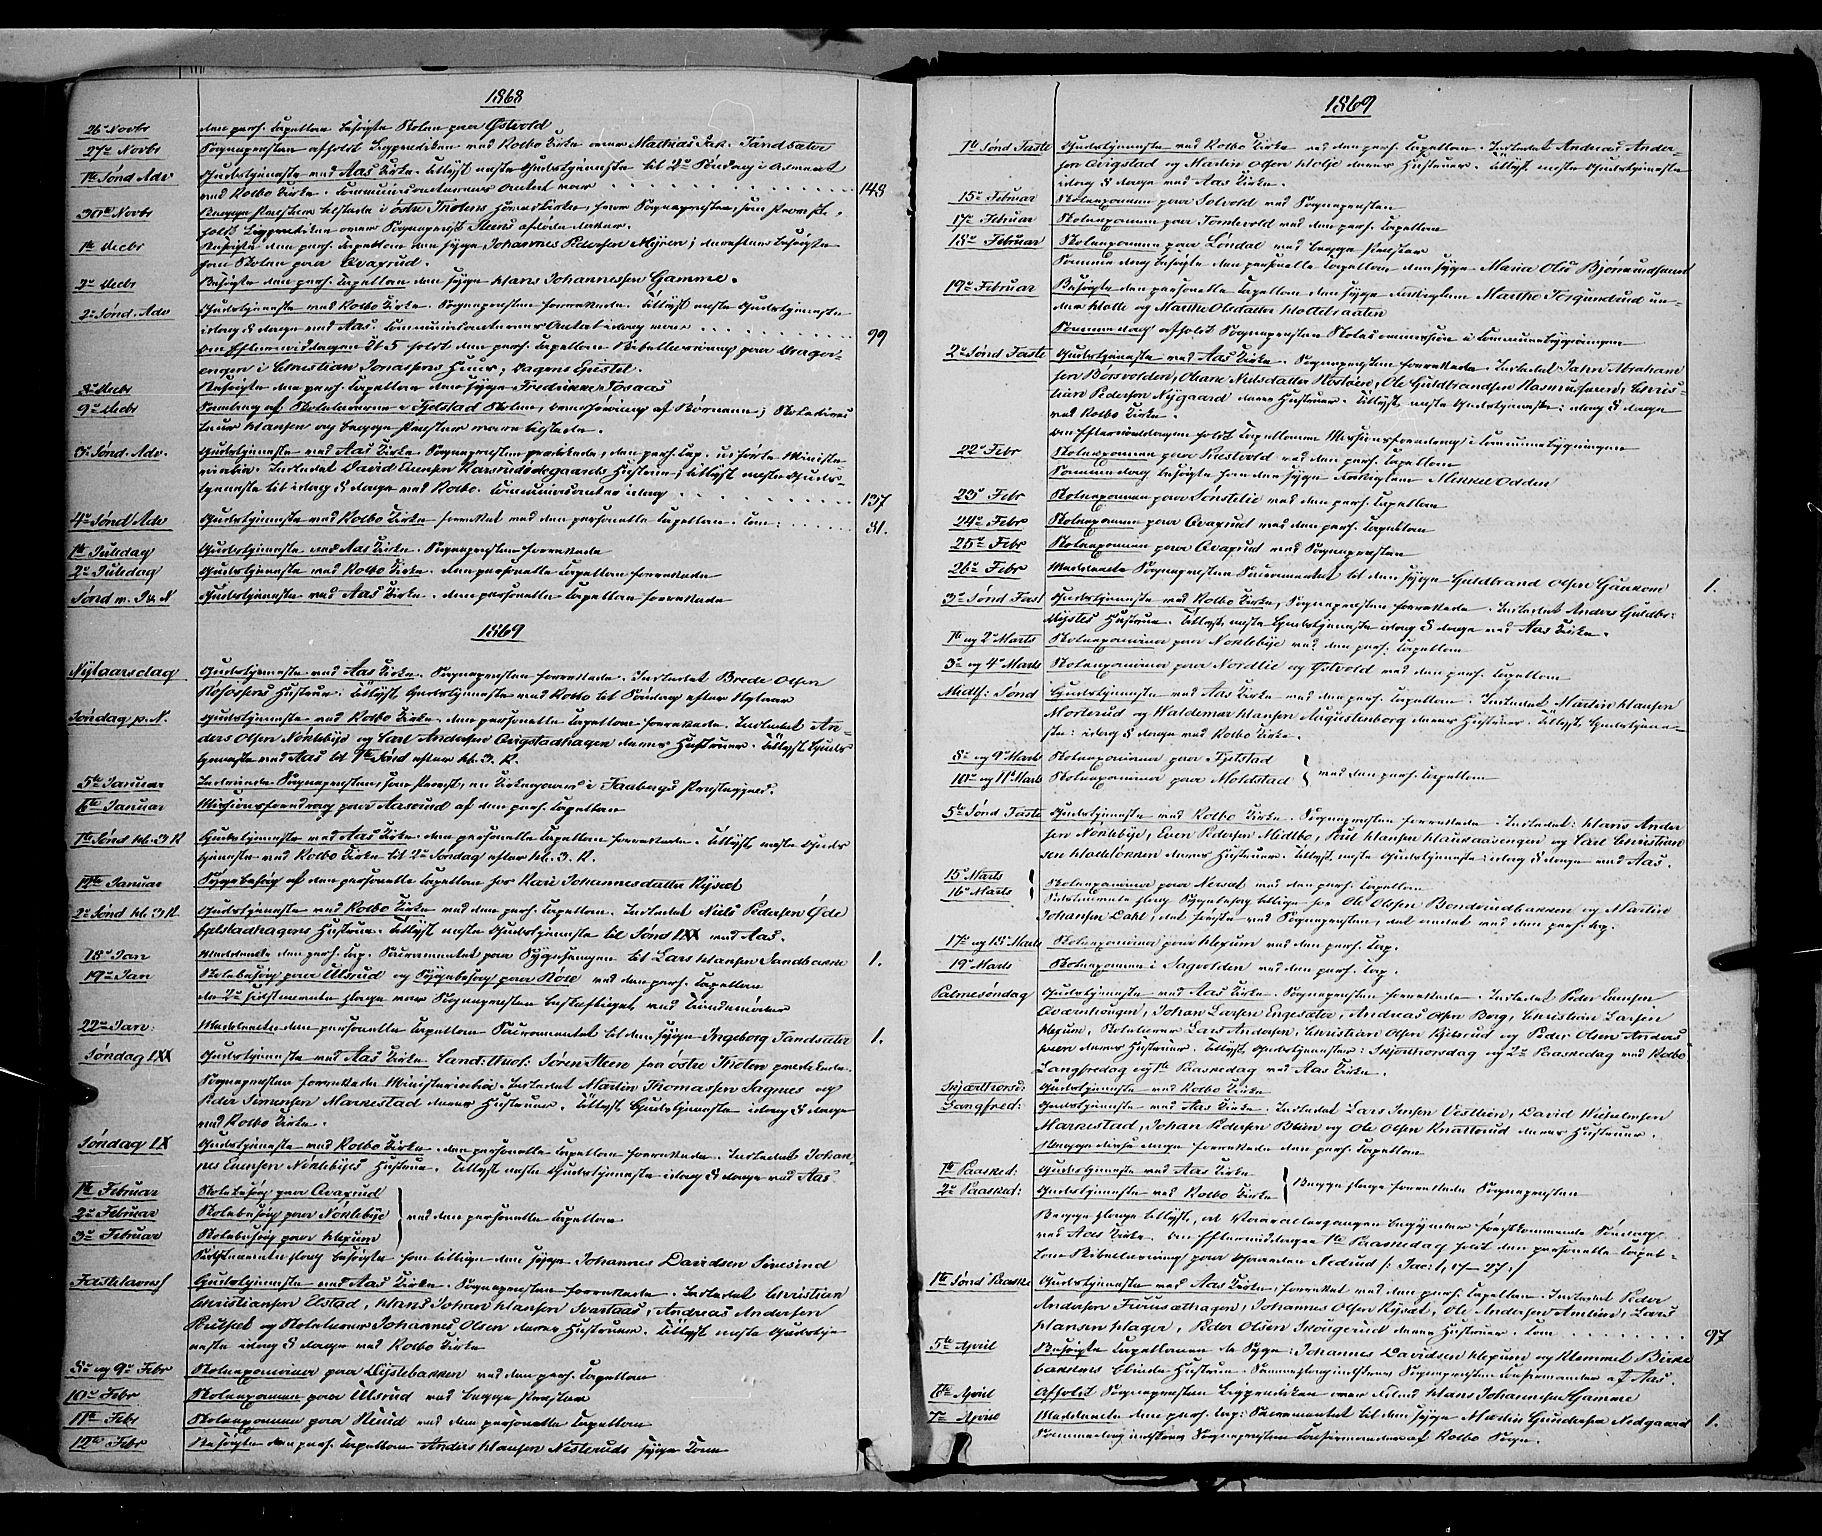 SAH, Vestre Toten prestekontor, H/Ha/Haa/L0007: Ministerialbok nr. 7, 1862-1869, s. 380